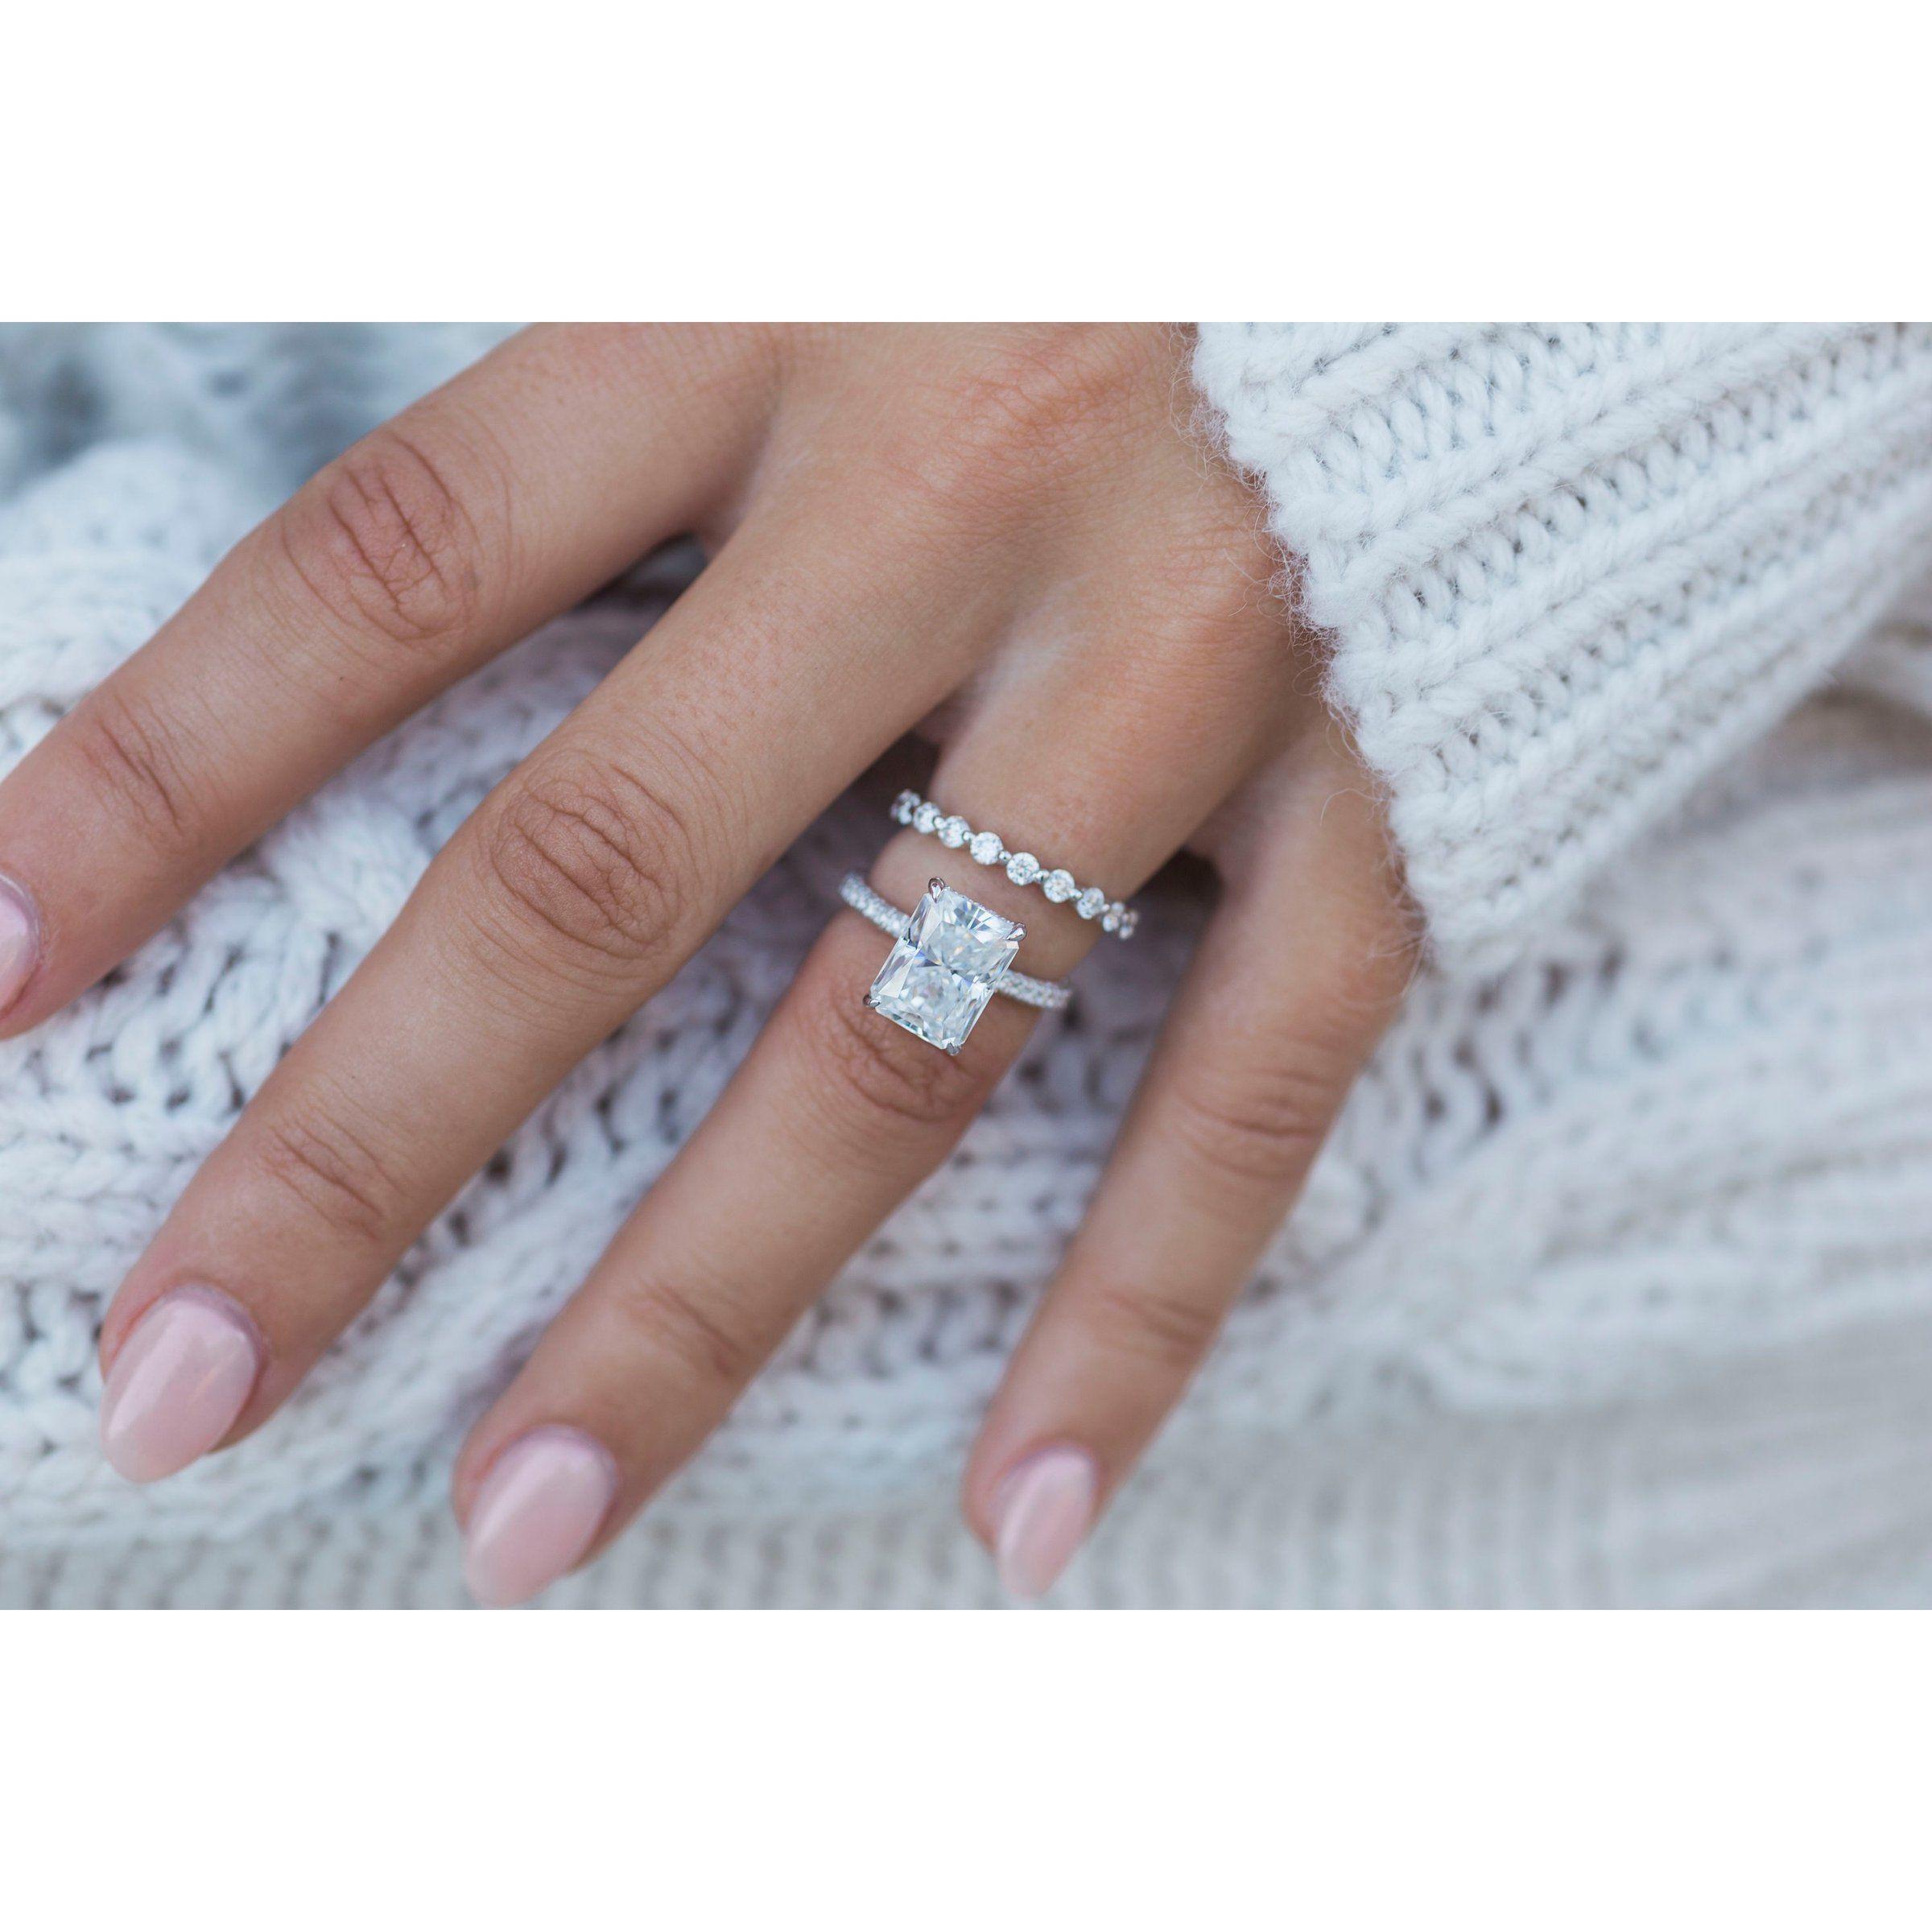 The Rowan Ring (3.55 Carat) Cartier love ring, Cartier